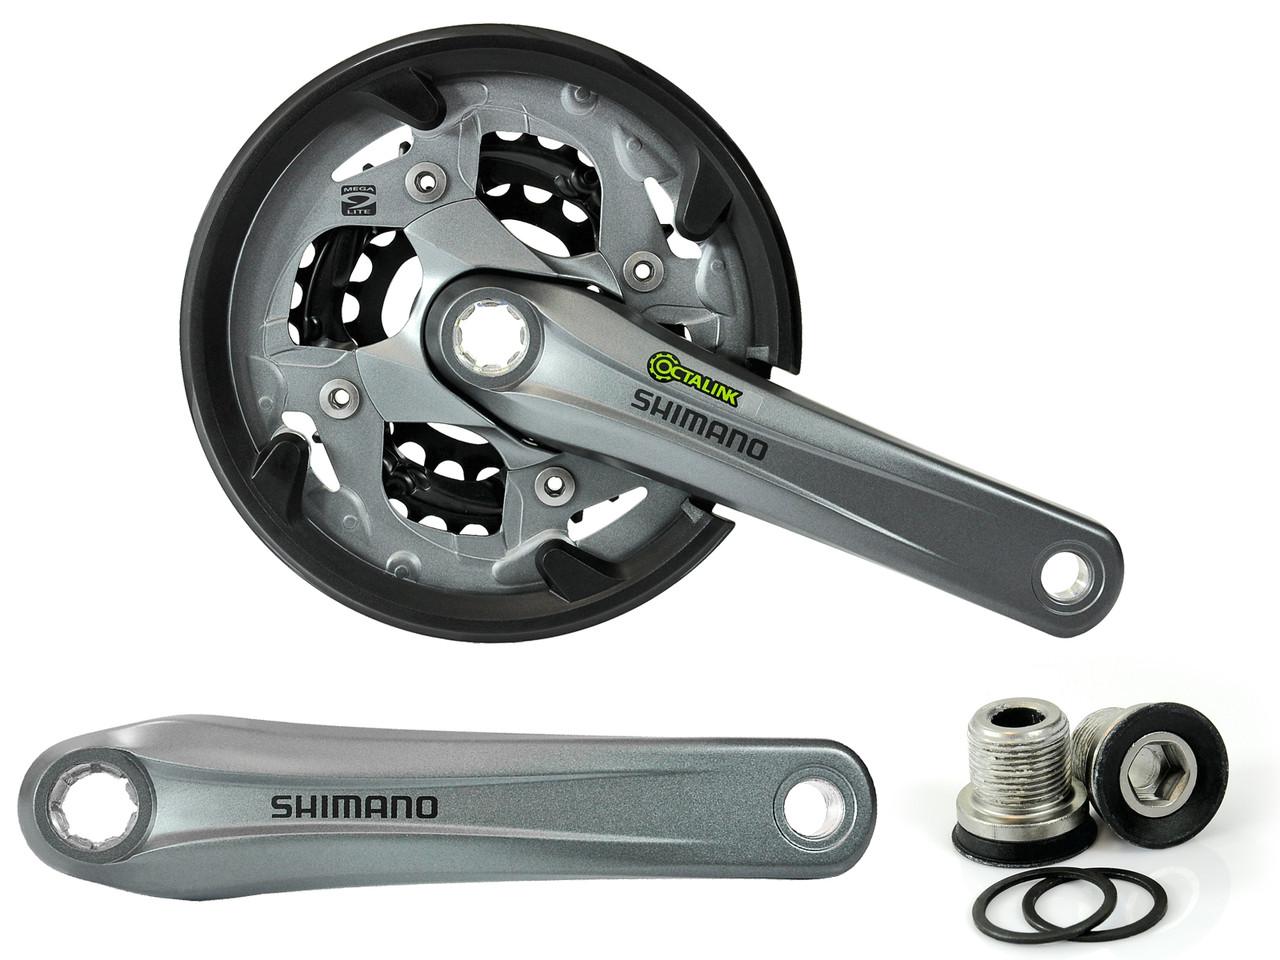 Shimano Alivio FC-M4000 40x30x22T